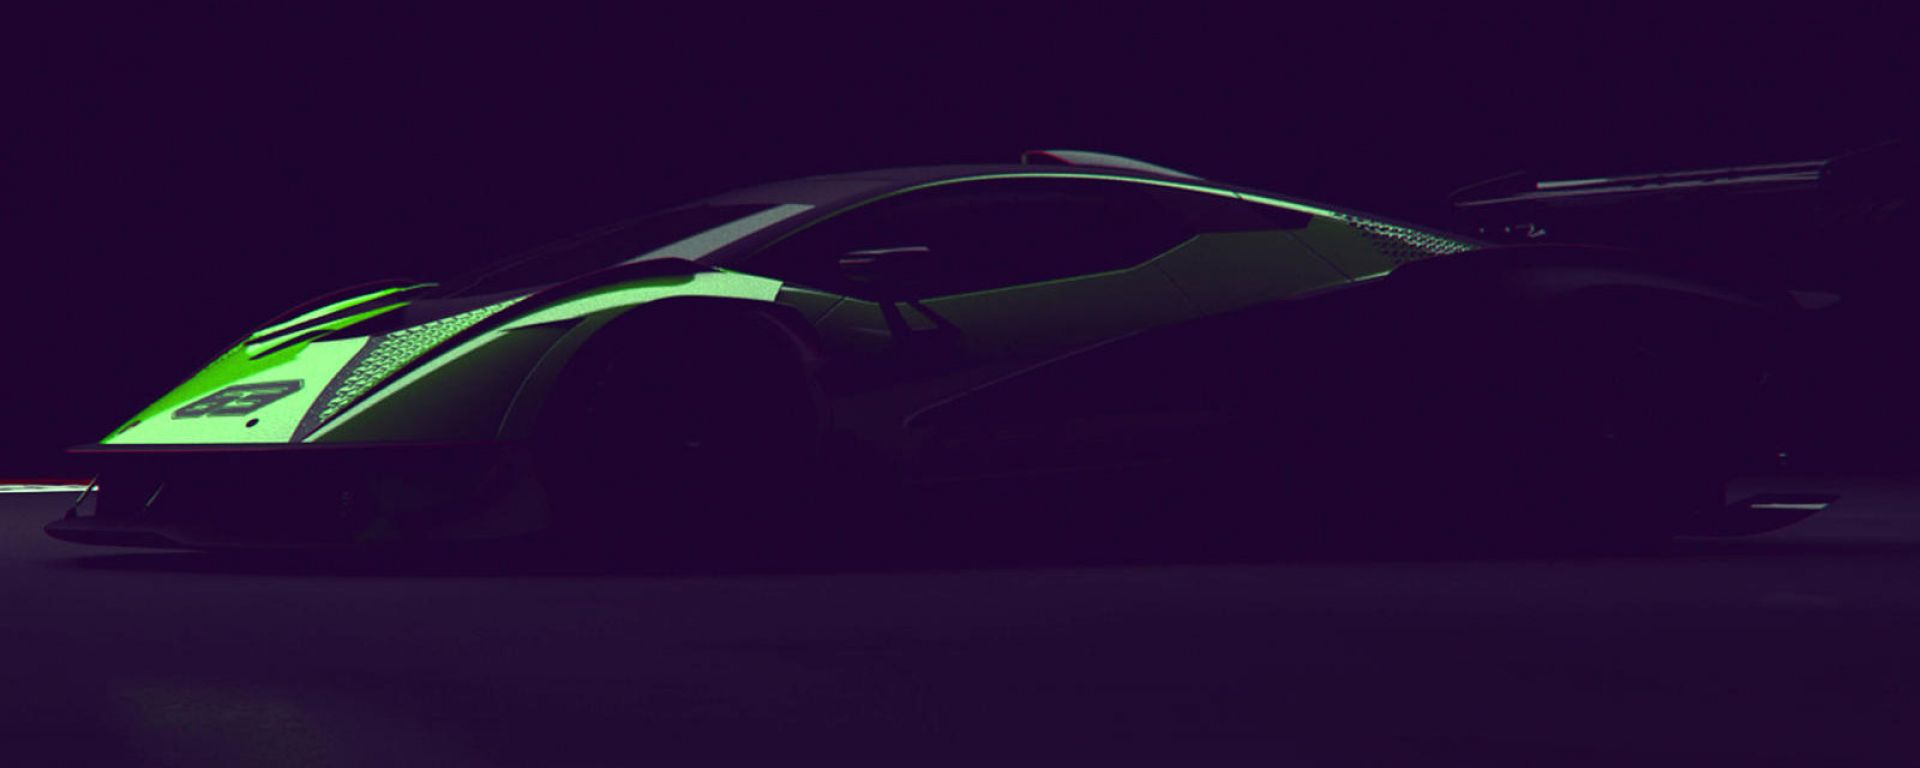 Hypercar Lamborghini Squadra Corse V12: il teaser